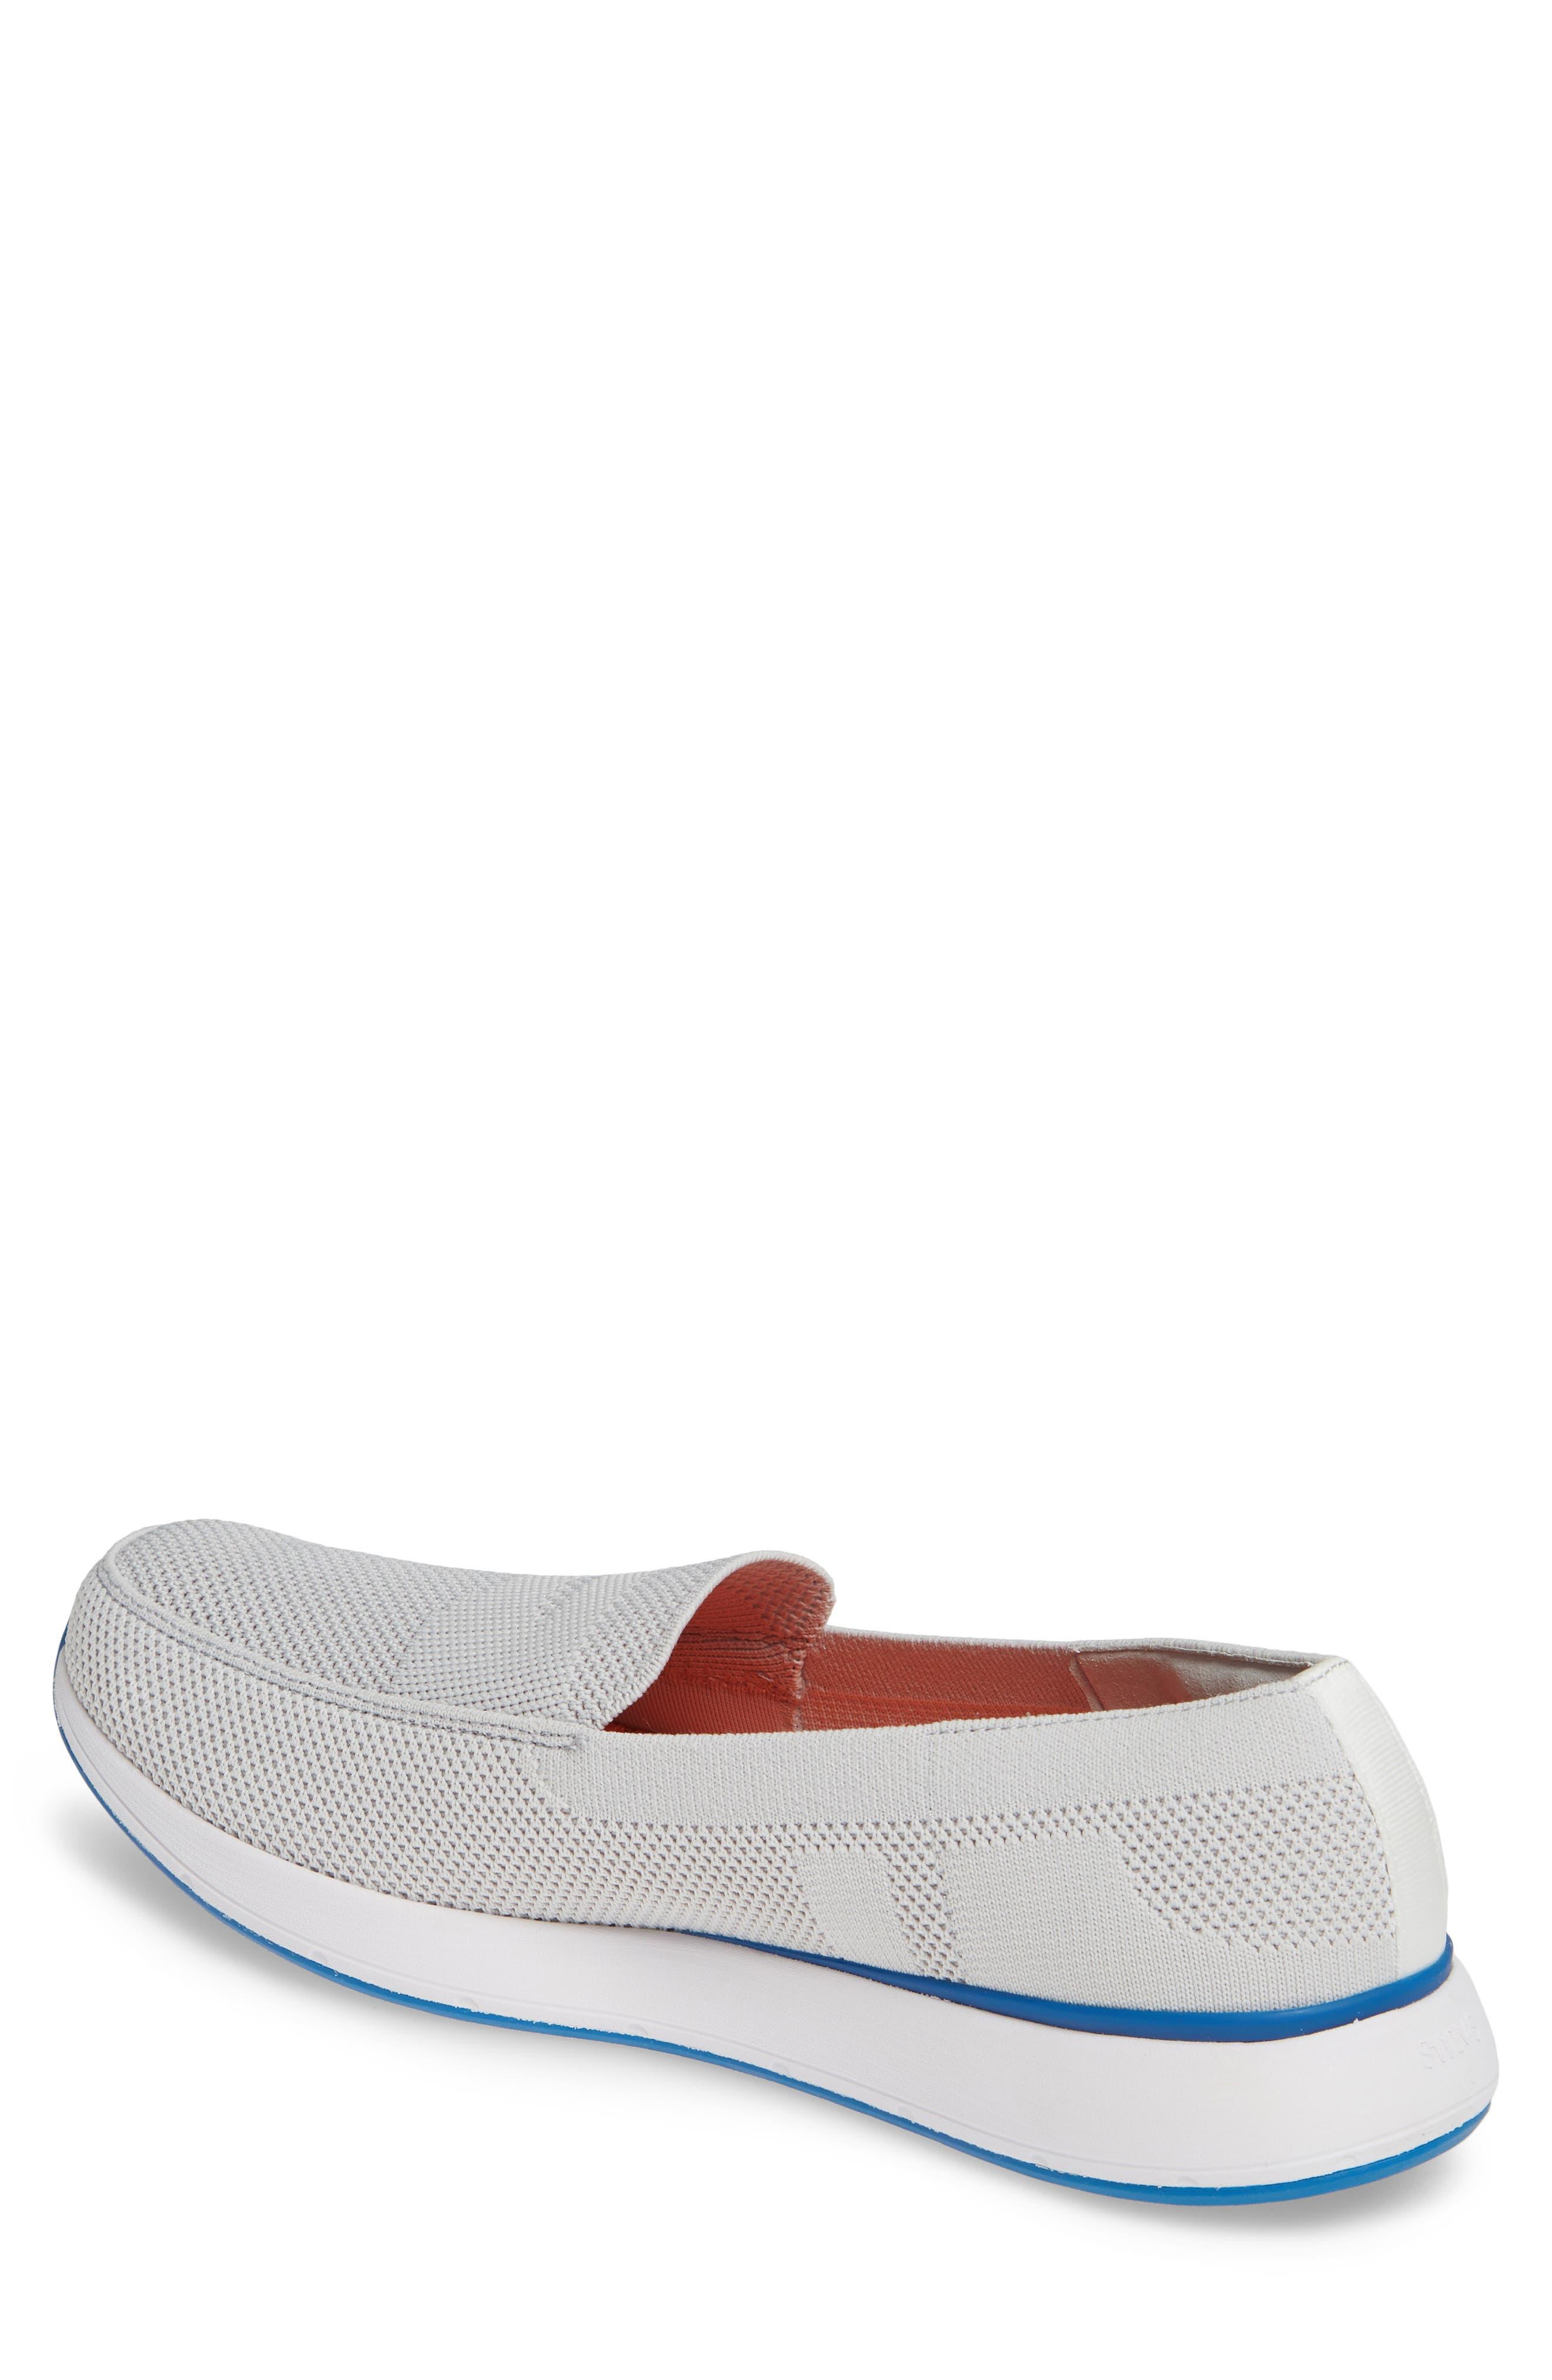 ece3f098d Swims Shoes